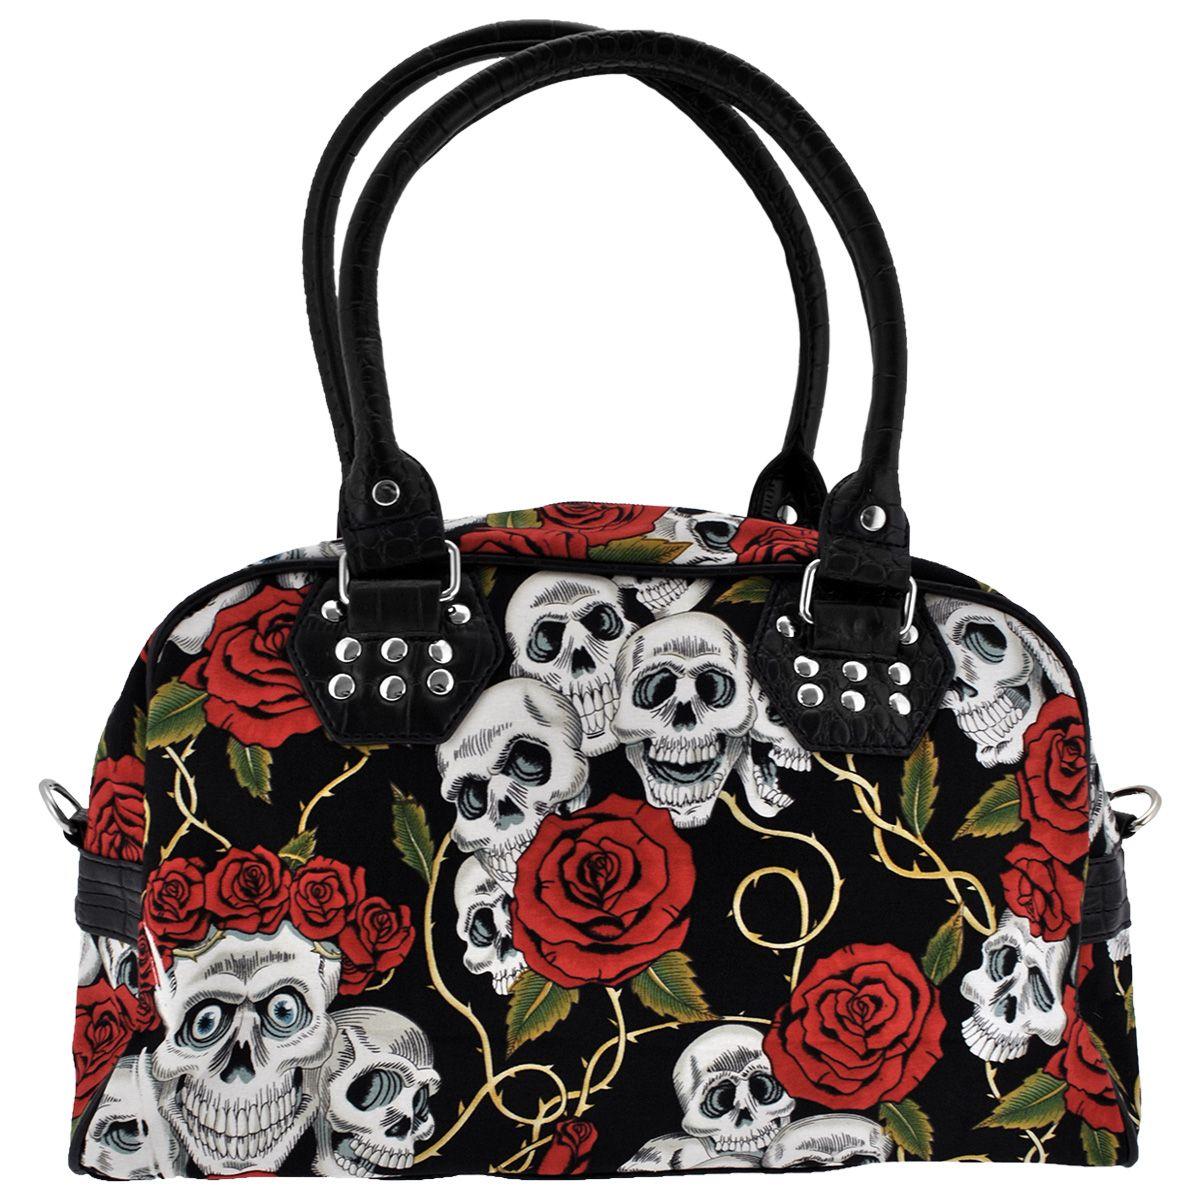 402d940db Sac à Main BANNED - Skulls & Roses - Rock A Gogo